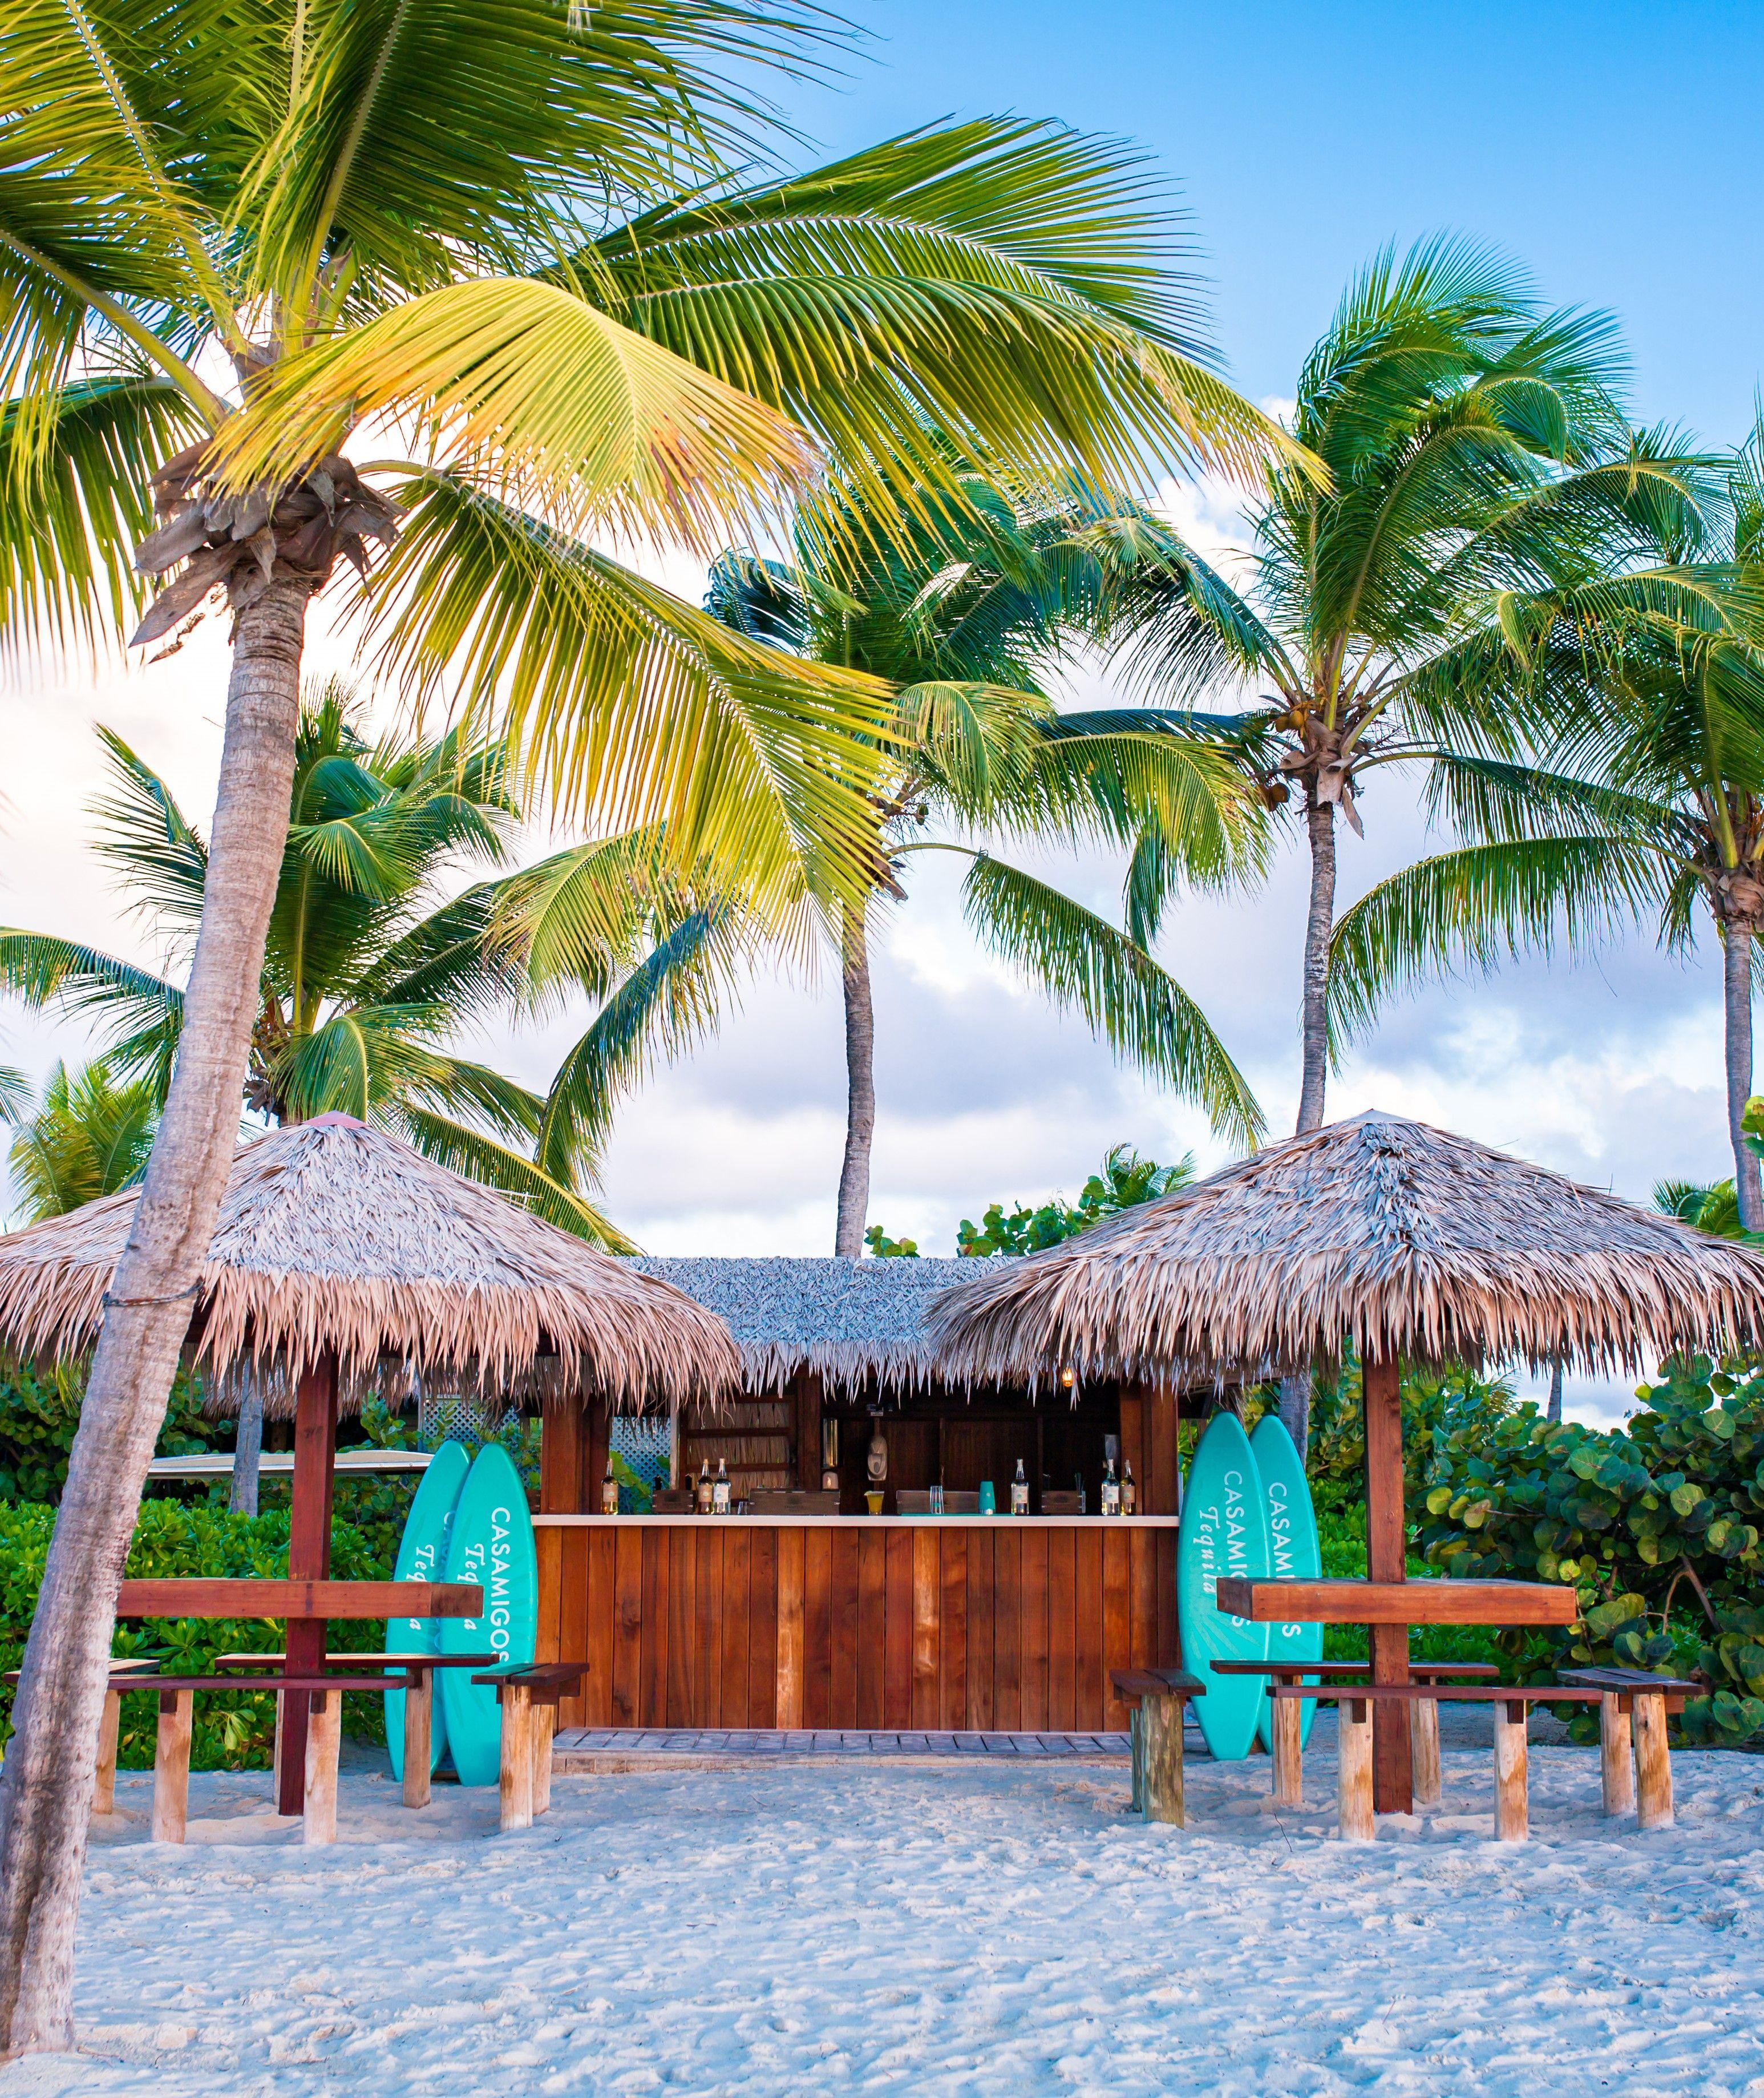 Casamigos Margarita Beach Shack pop-up at Jumby Bay Island